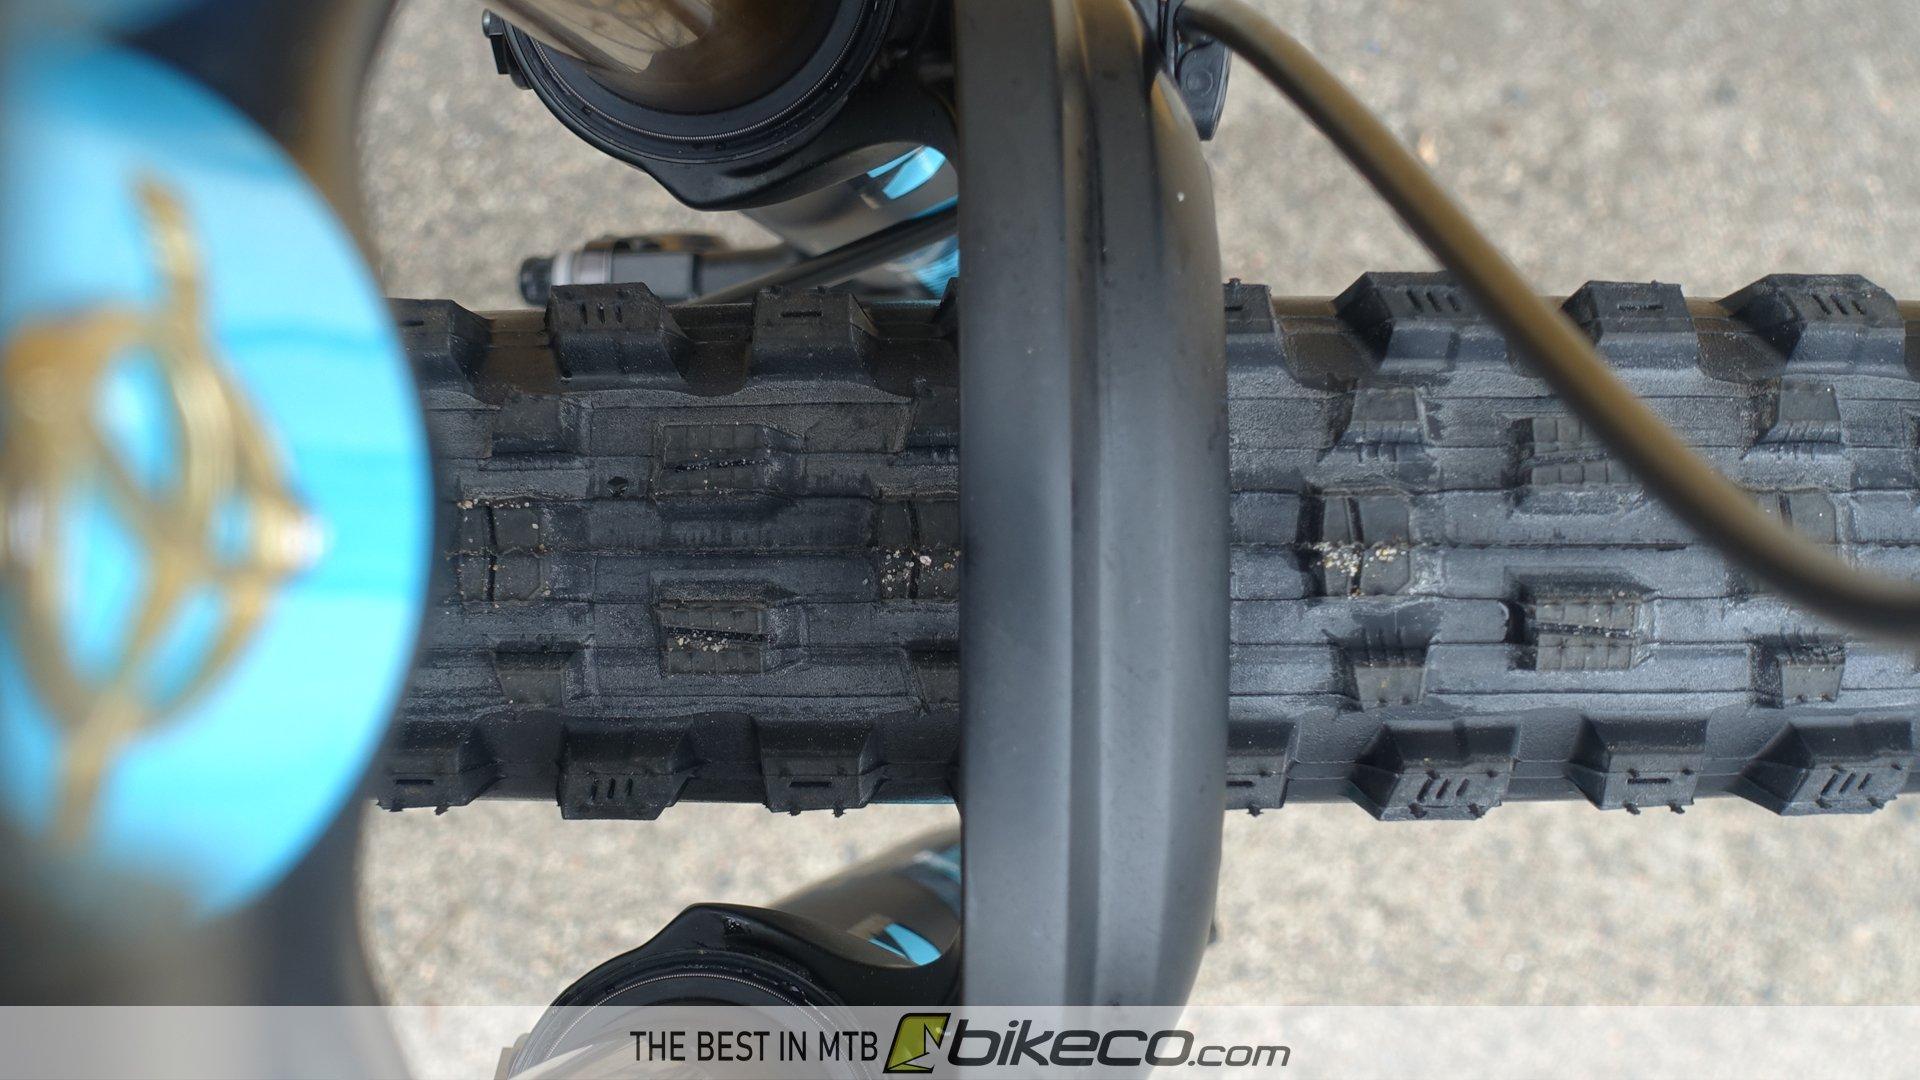 RideFast LocoMoto rim with tire mounted